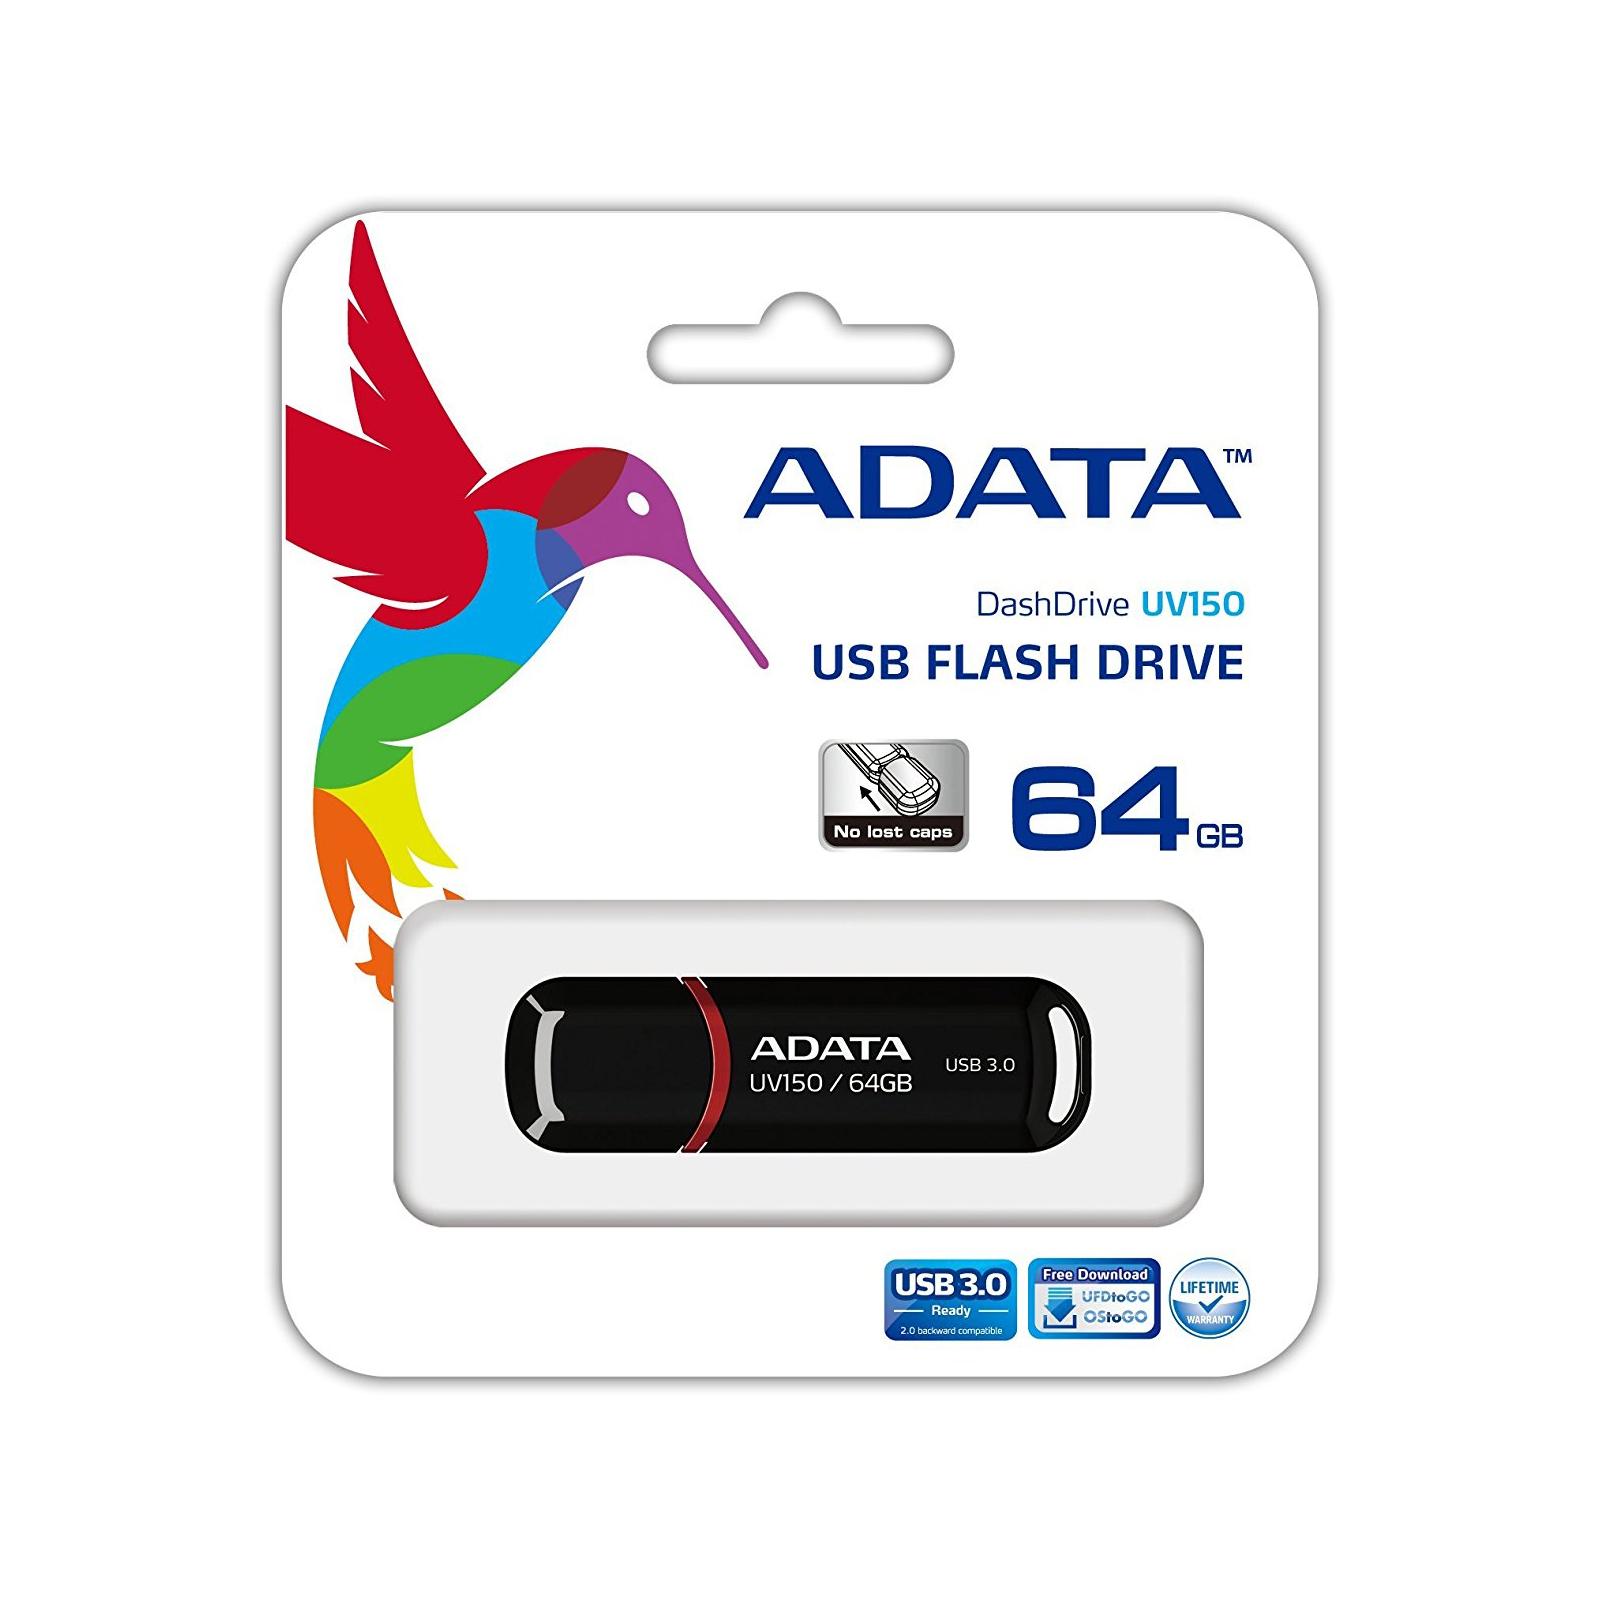 USB флеш накопитель ADATA 64GB UV150 Black USB 3.0 (AUV150-64G-RBK) изображение 4